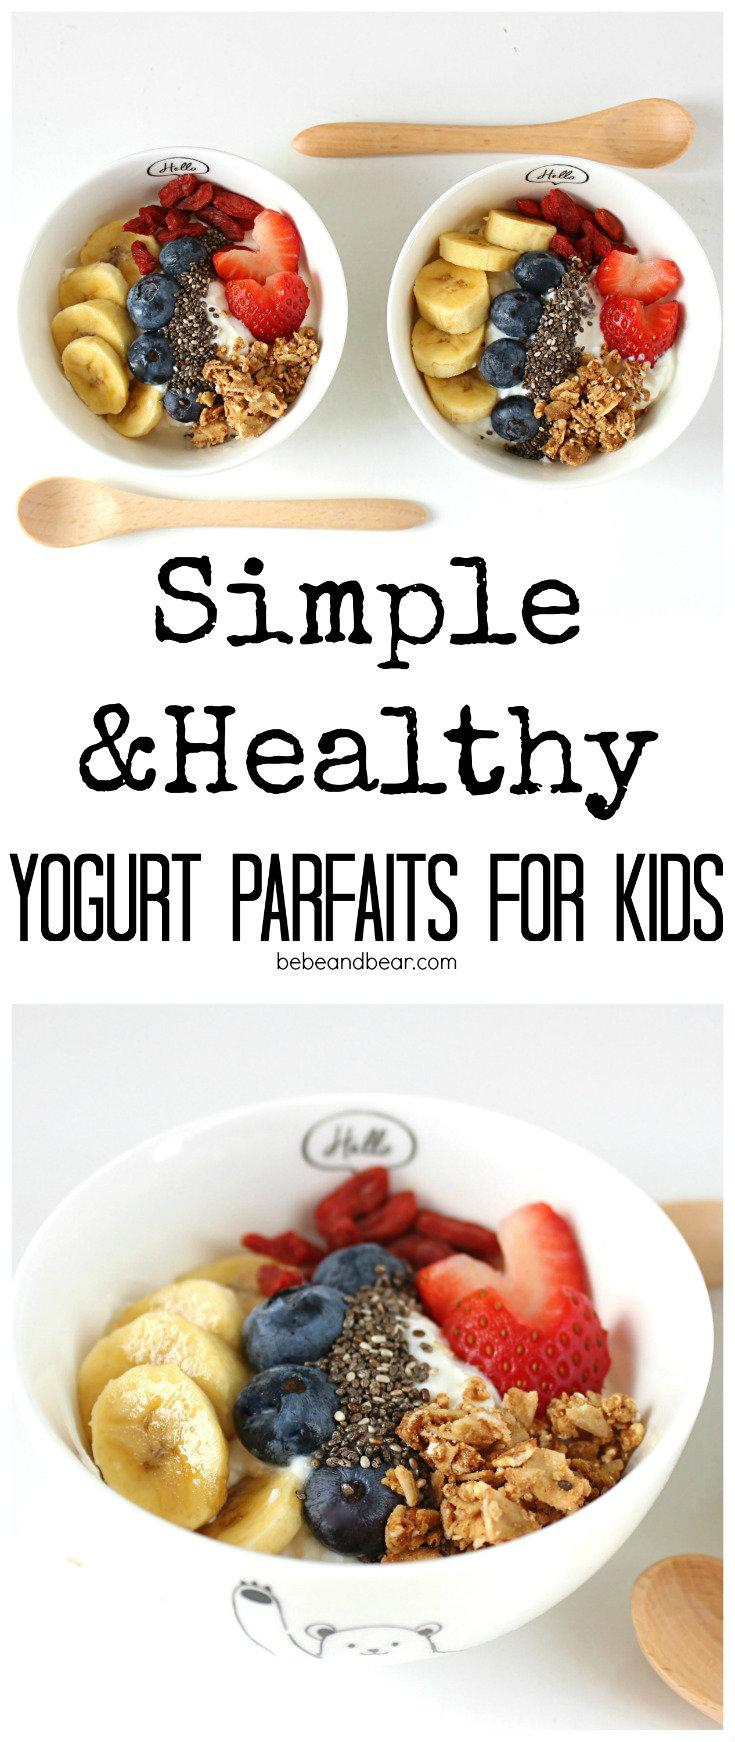 Simple and Healthy yogurt Parfait for kids